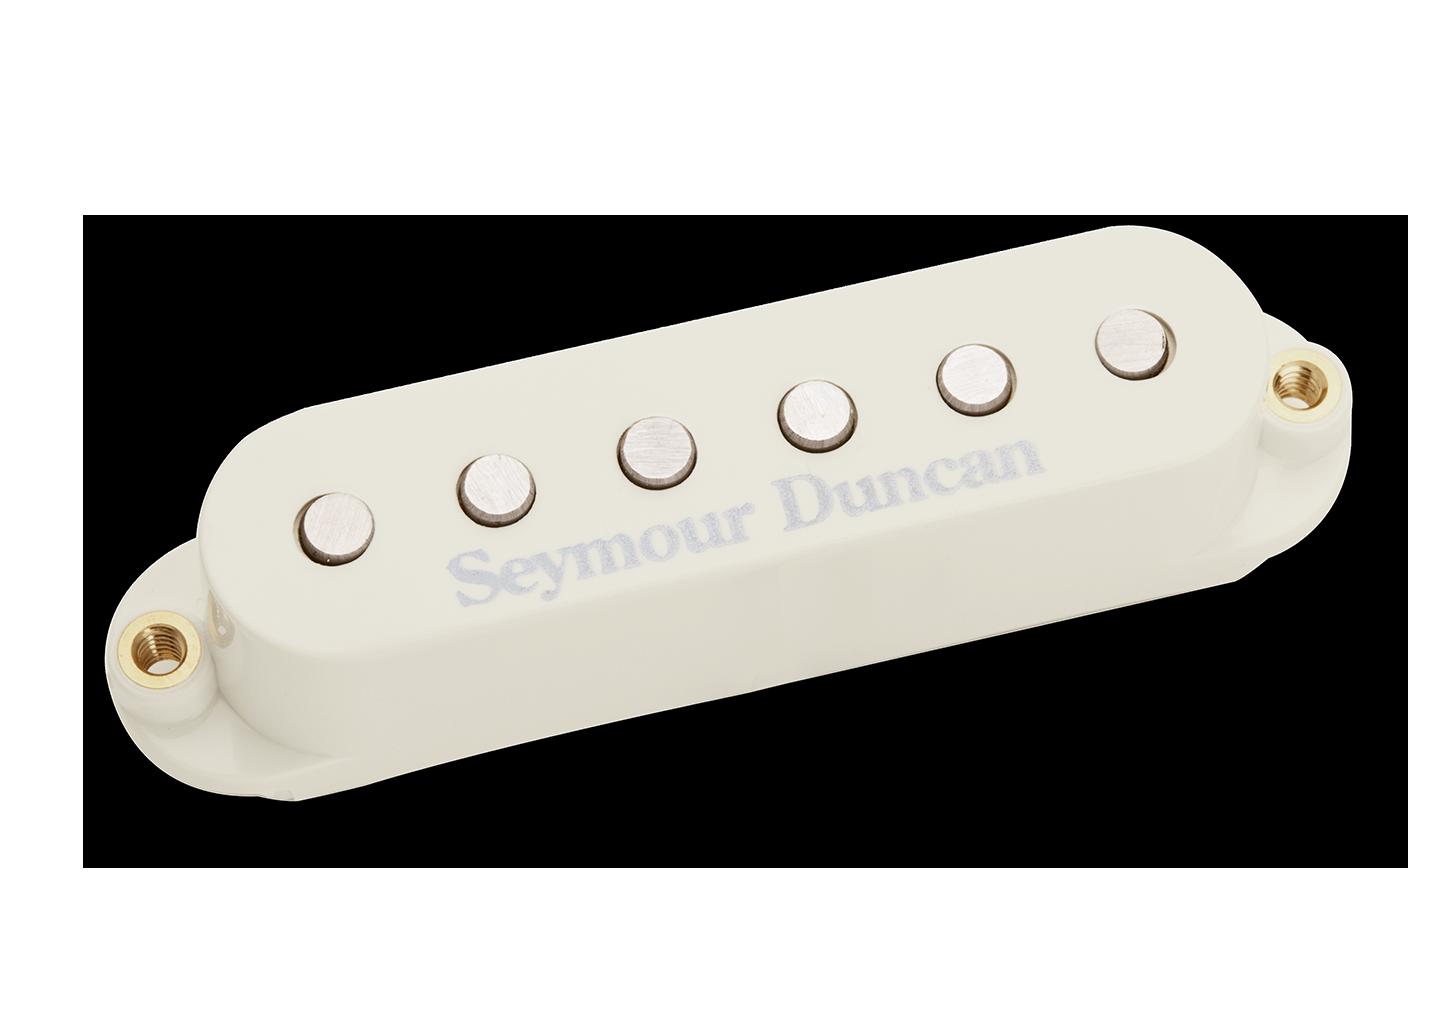 Seymour Duncan Classic Stack Plus Strat STK-S4M - Middle Parchment